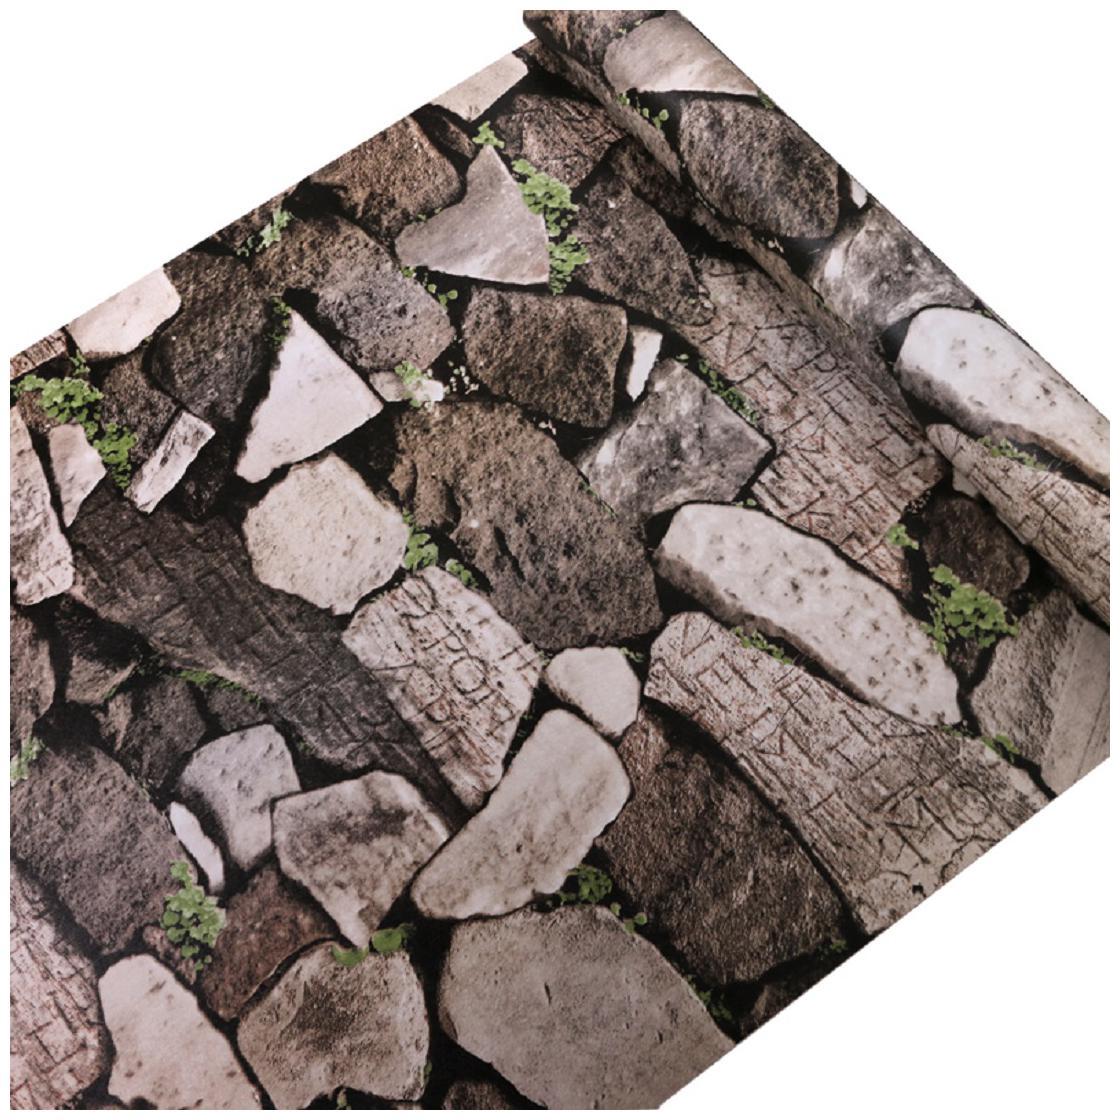 Buy Jaamso Royals Waterproof Self Adhesive White Grey Brick Pattern Peel Stick Wallpaper Brick Contact Paper Backsplash Sticker Shelf Liner Removable Door Vinyl Flooring Online At Low Prices In India Paytmmall Com